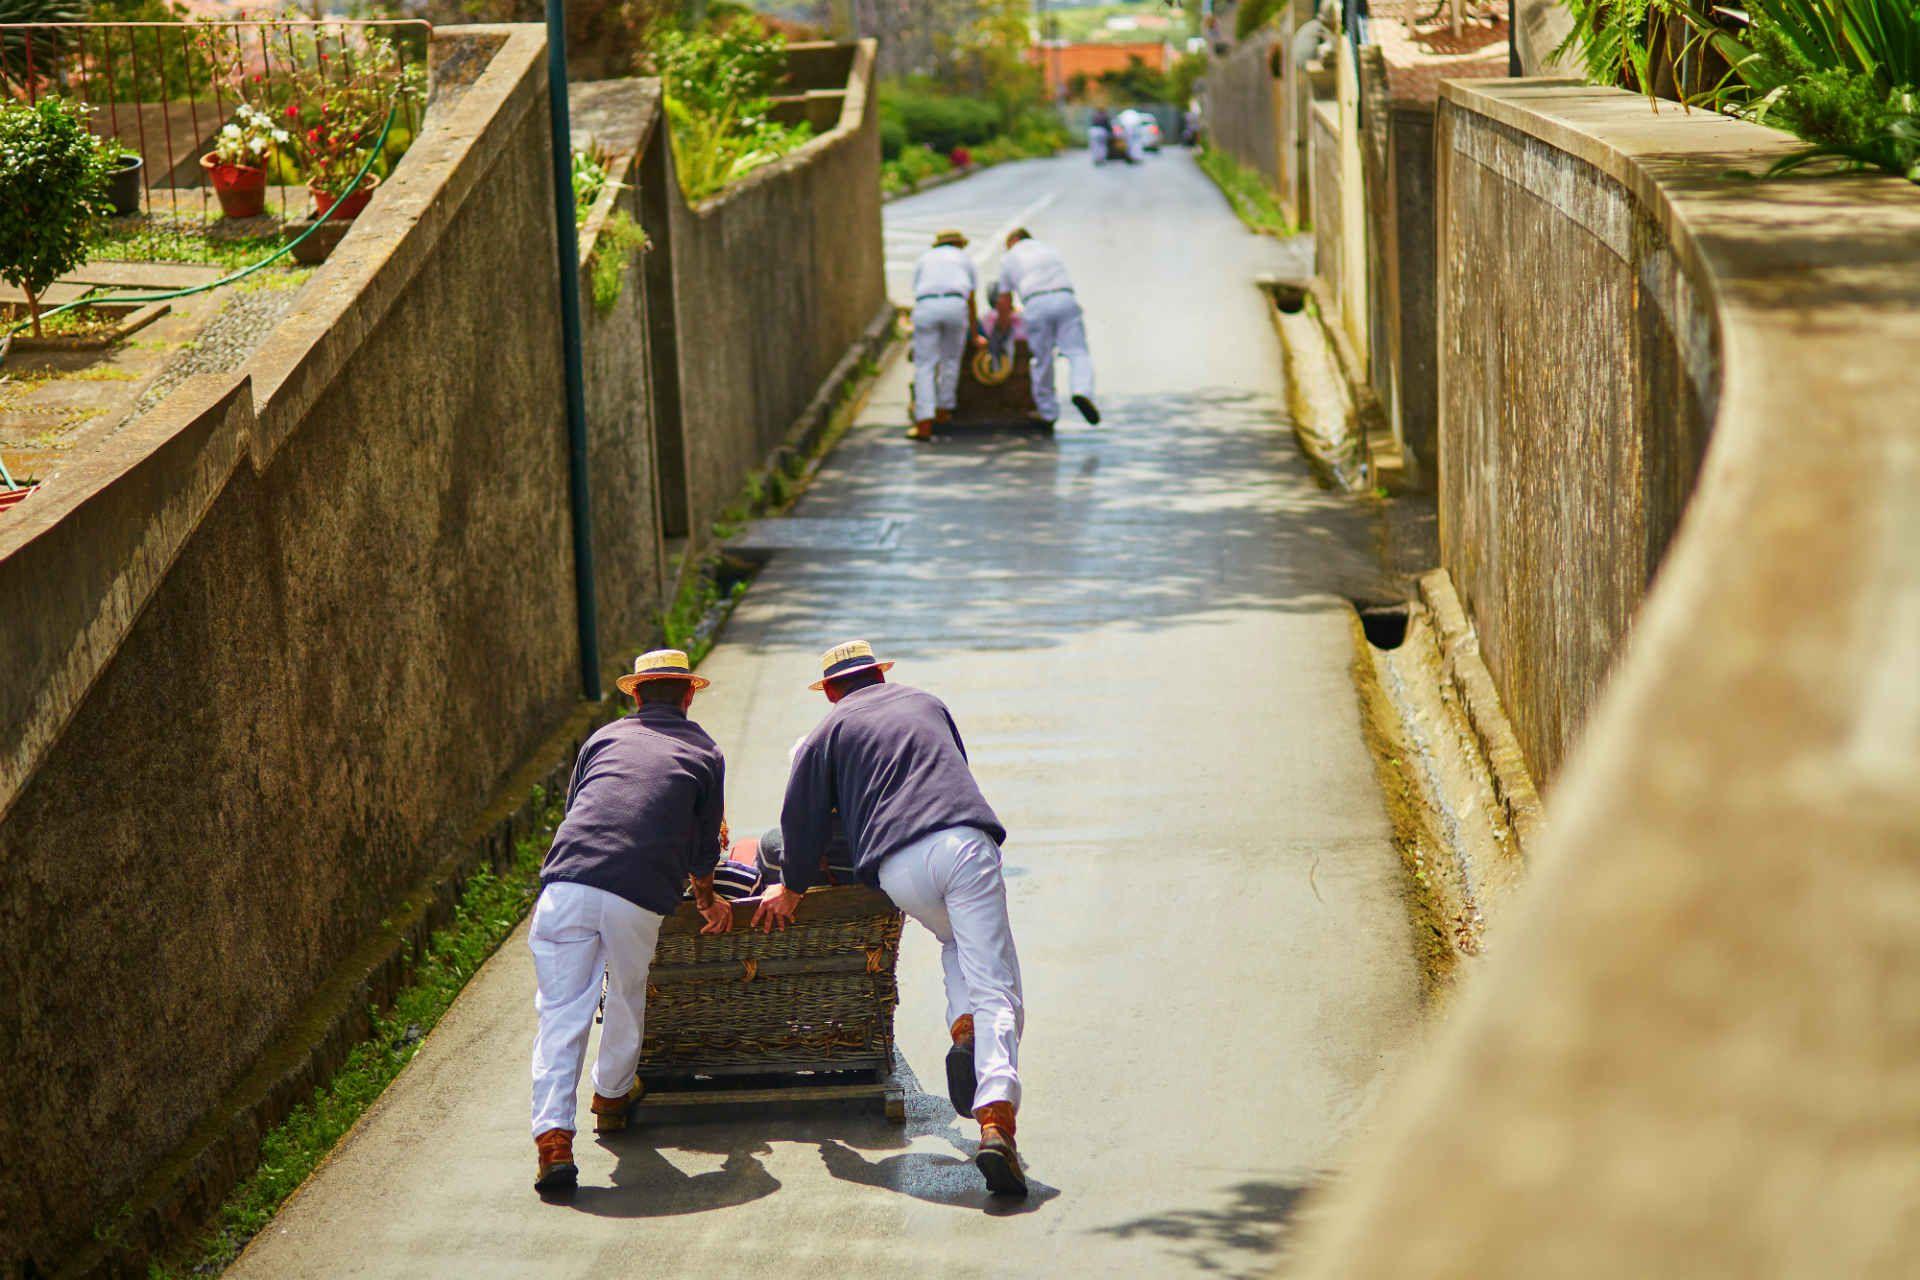 toboggan-bois-luge-funchal-madère-portugal-shutterstock_630780314